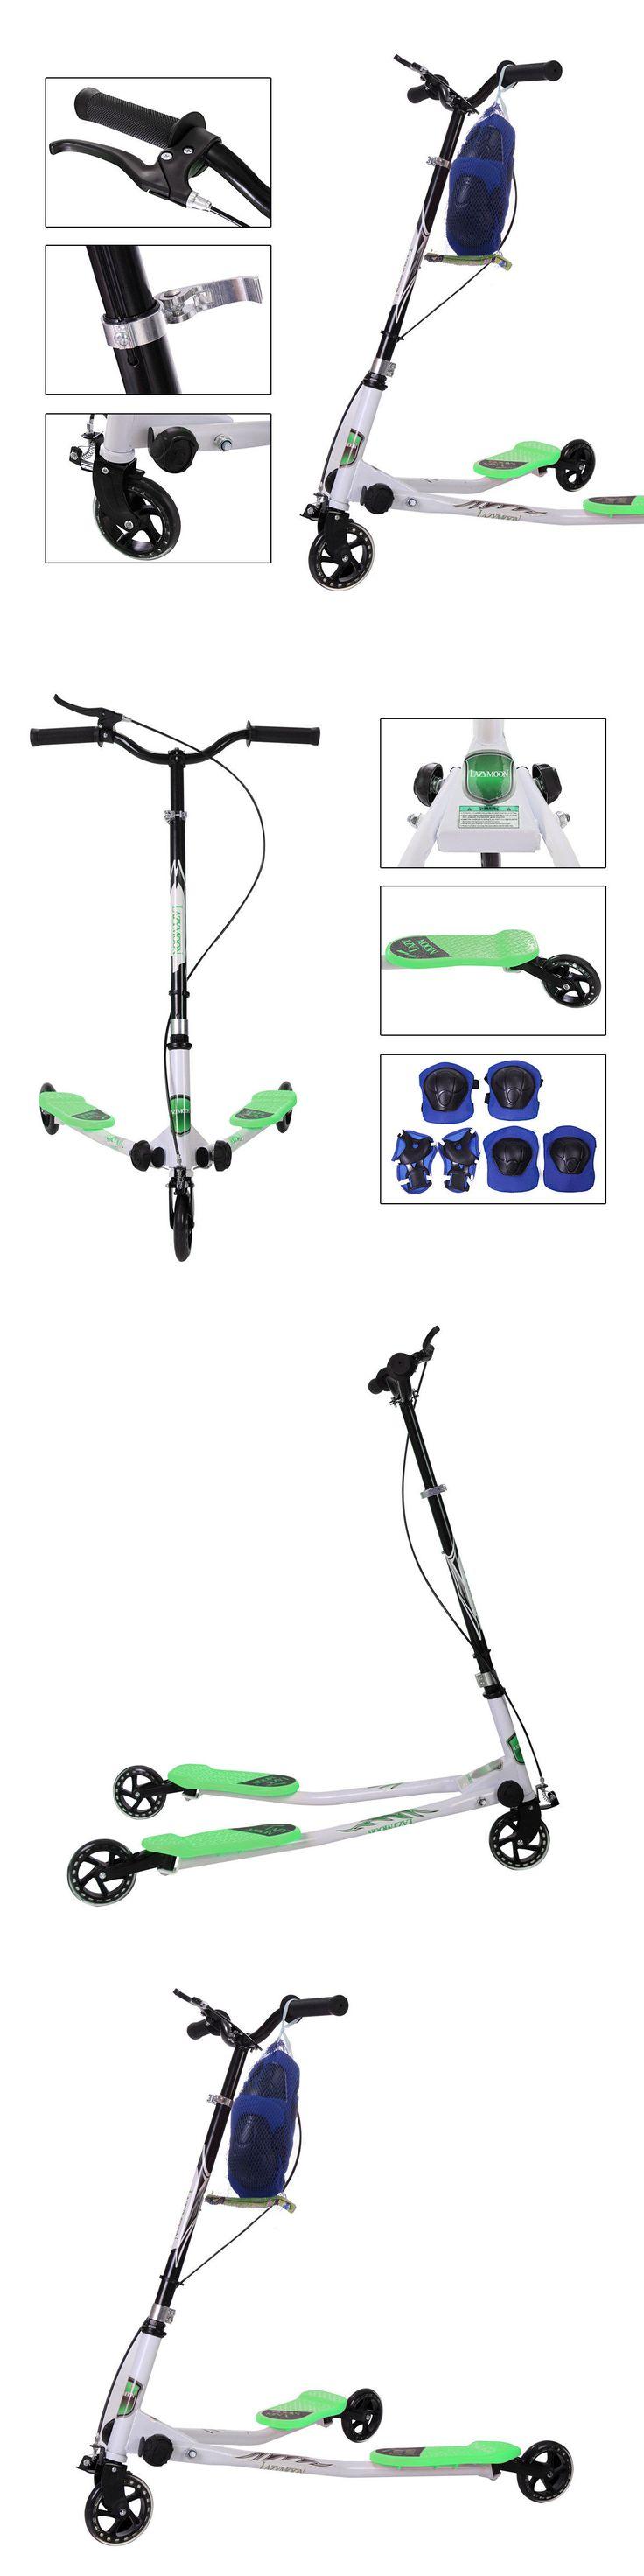 Kick Scooters 11331: Green Kids Scooter Wiggle Y Flicker Foldable Speeder Tri Slider Kickboard Medium -> BUY IT NOW ONLY: $53.99 on eBay!